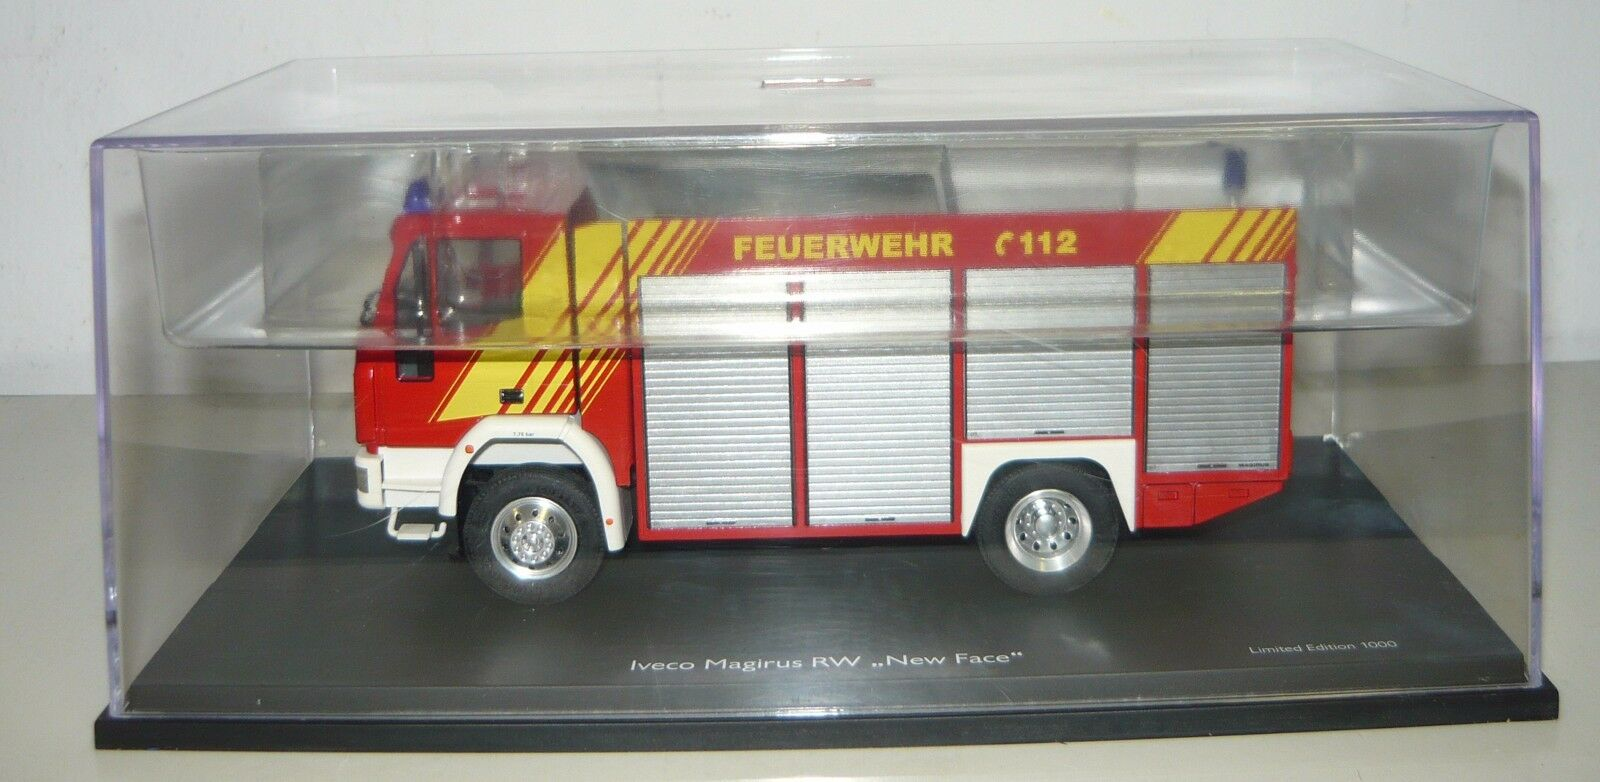 Schuco 07134, IVECO MAGIRUS RW  New Face , FW-Véhicule (Nuremberg), 1 43, neu&ovp